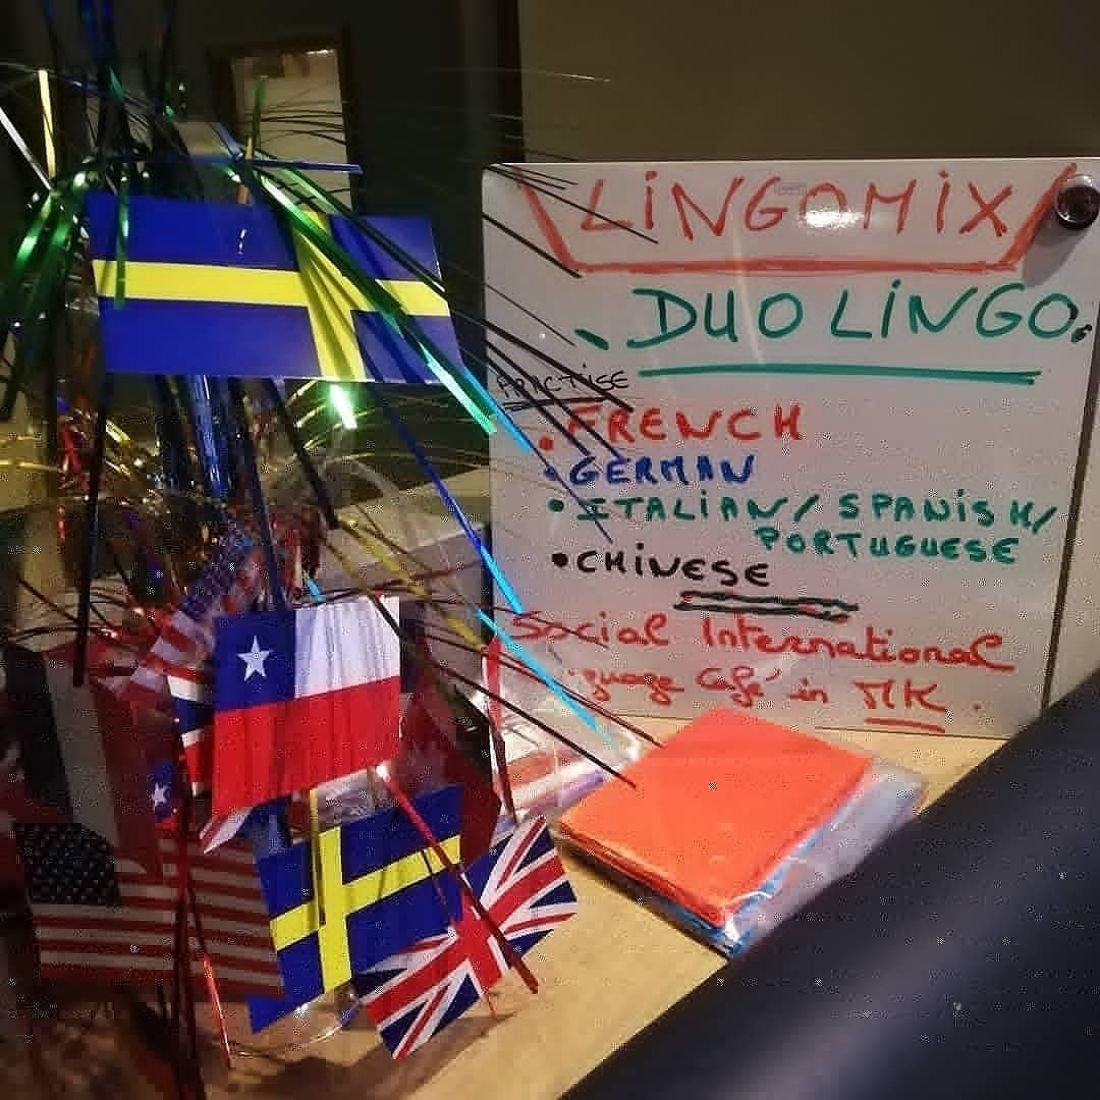 Duolingo Events in Milton Keynes , 13 November   Event in Milton Keynes   AllEvents.in